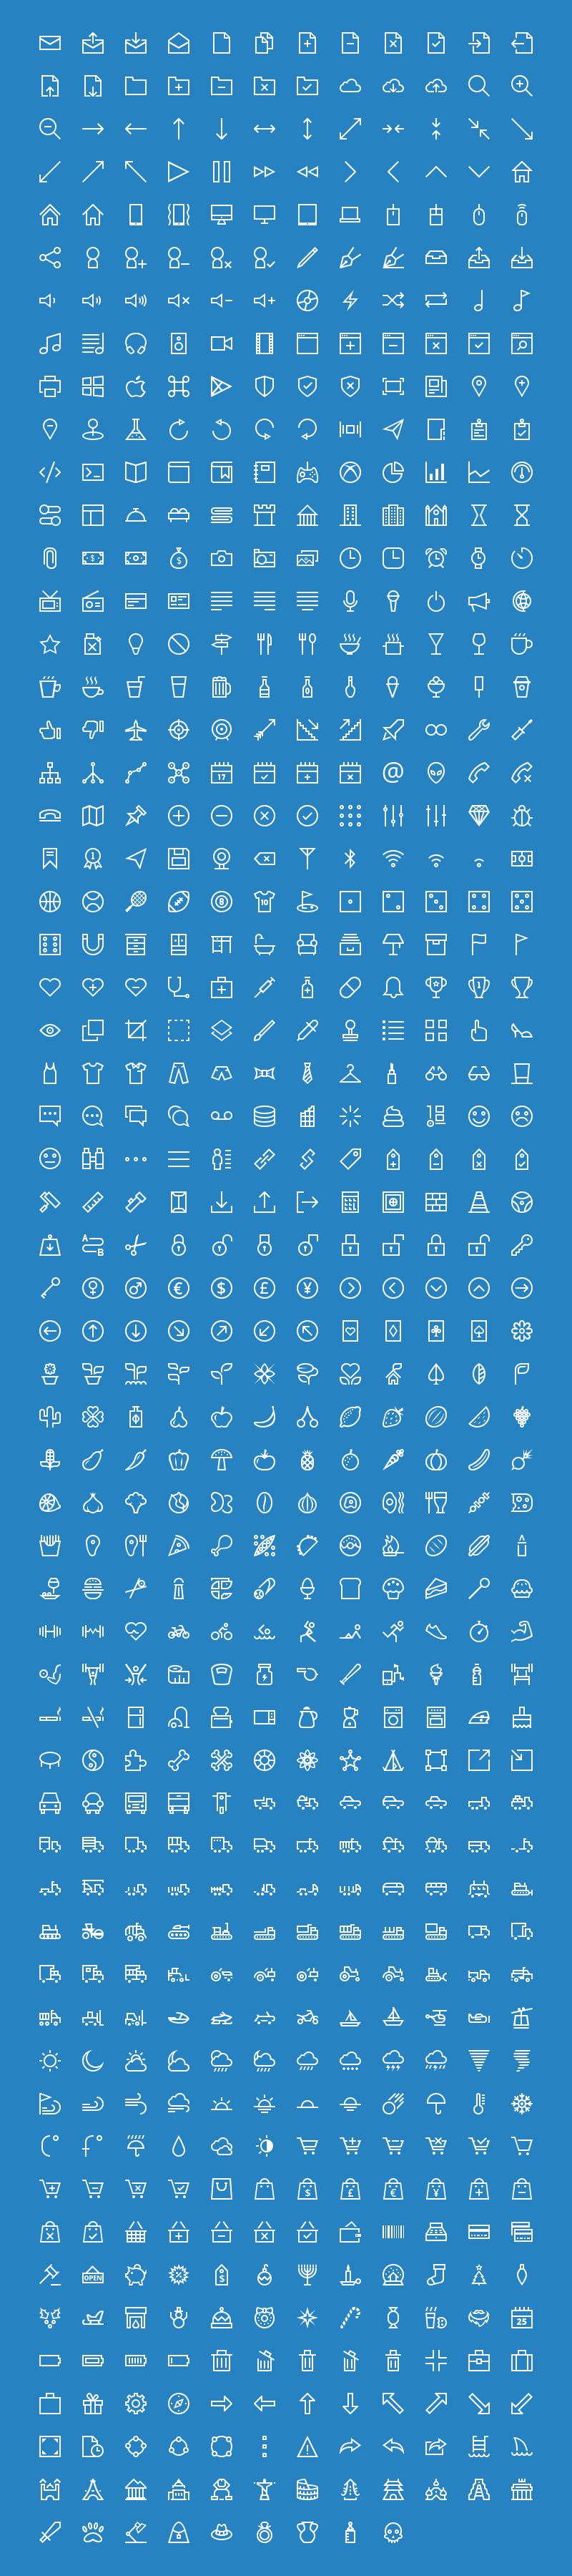 700+ Epic outline icon set